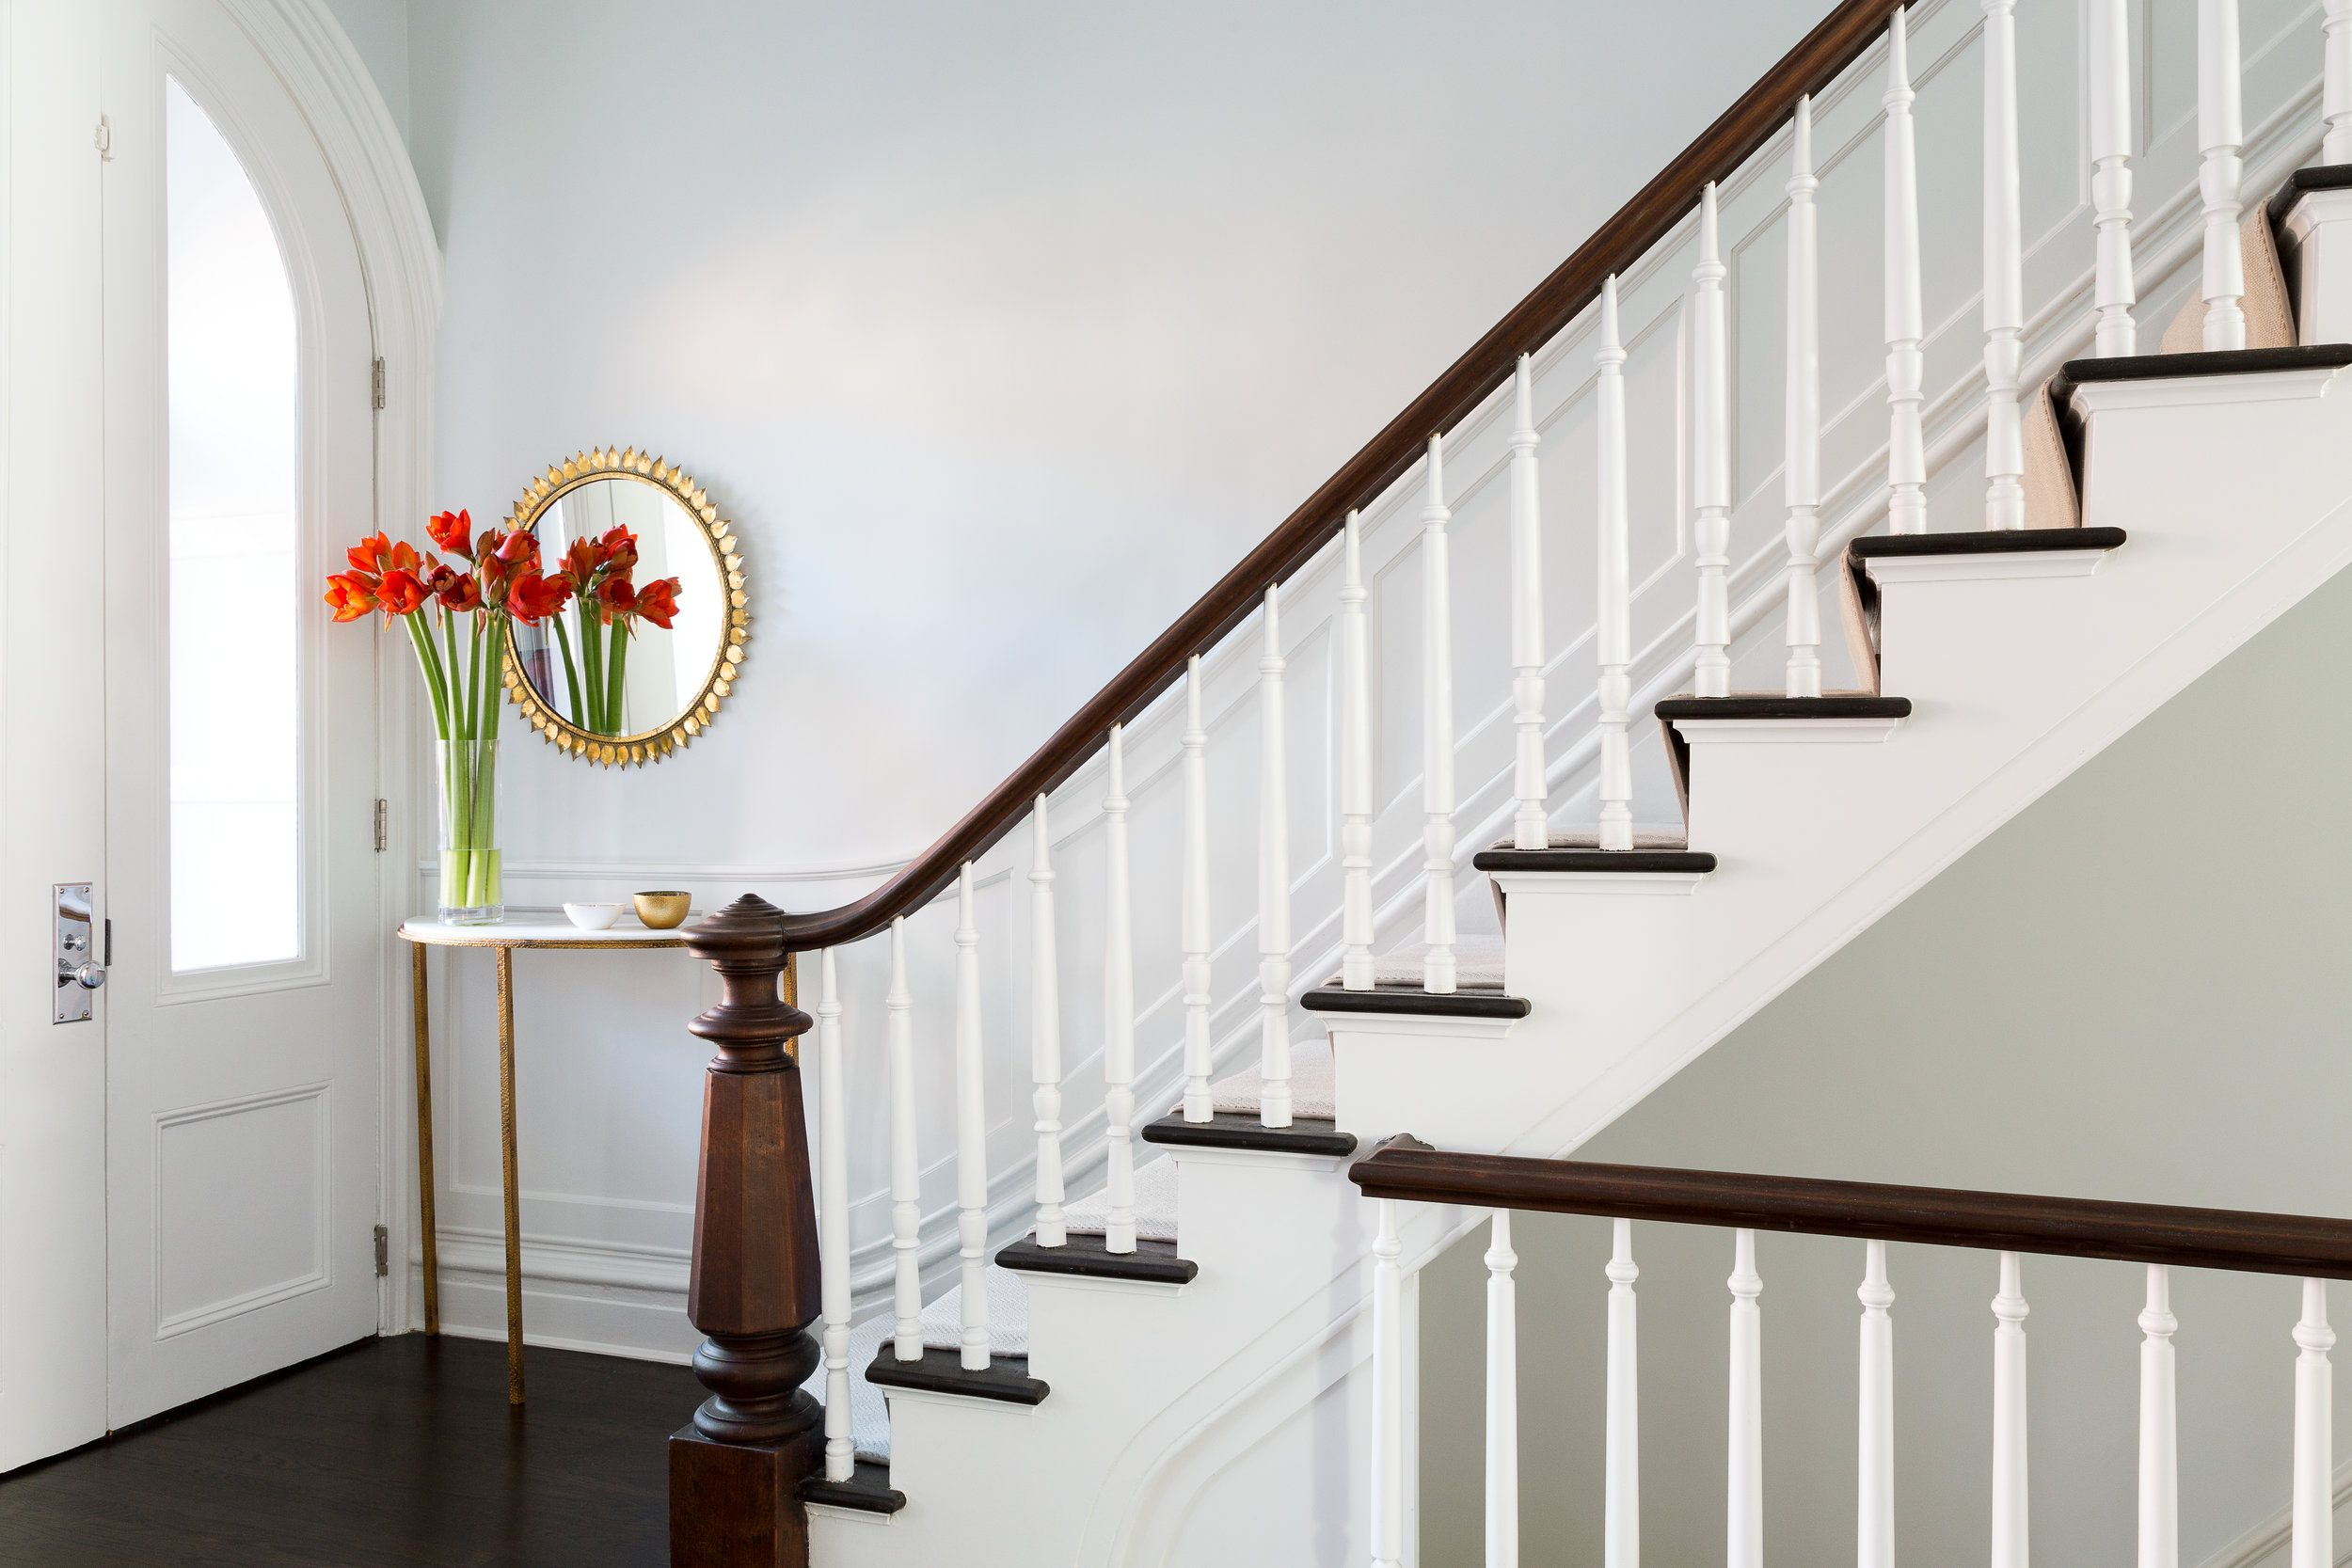 Pin by Desiree Reese Mottard on Decorating | Wood railings ...